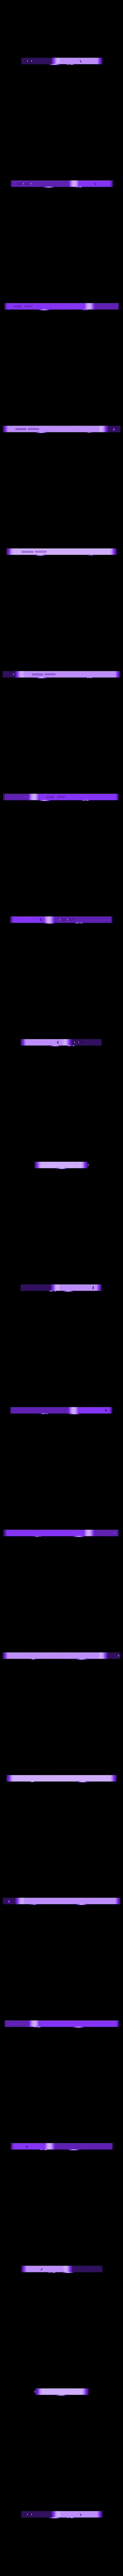 g6.stl Download STL file g6 • 3D printing object, parksm